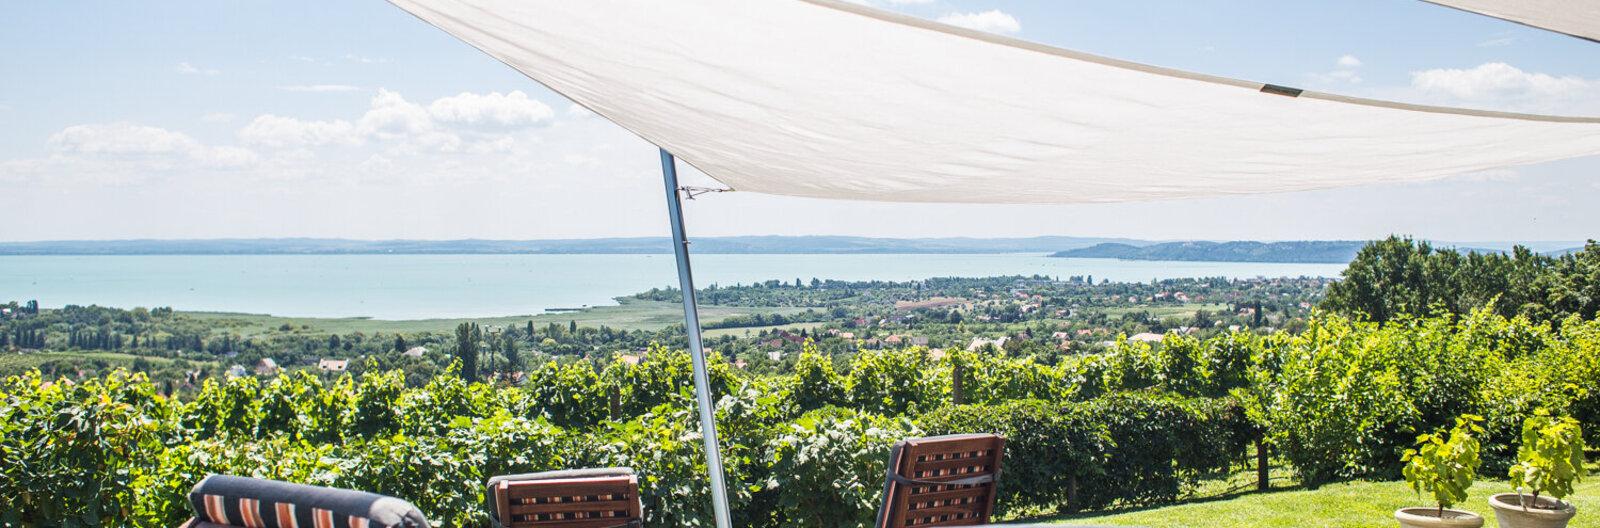 14 Balaton wine terraces to visit this summer